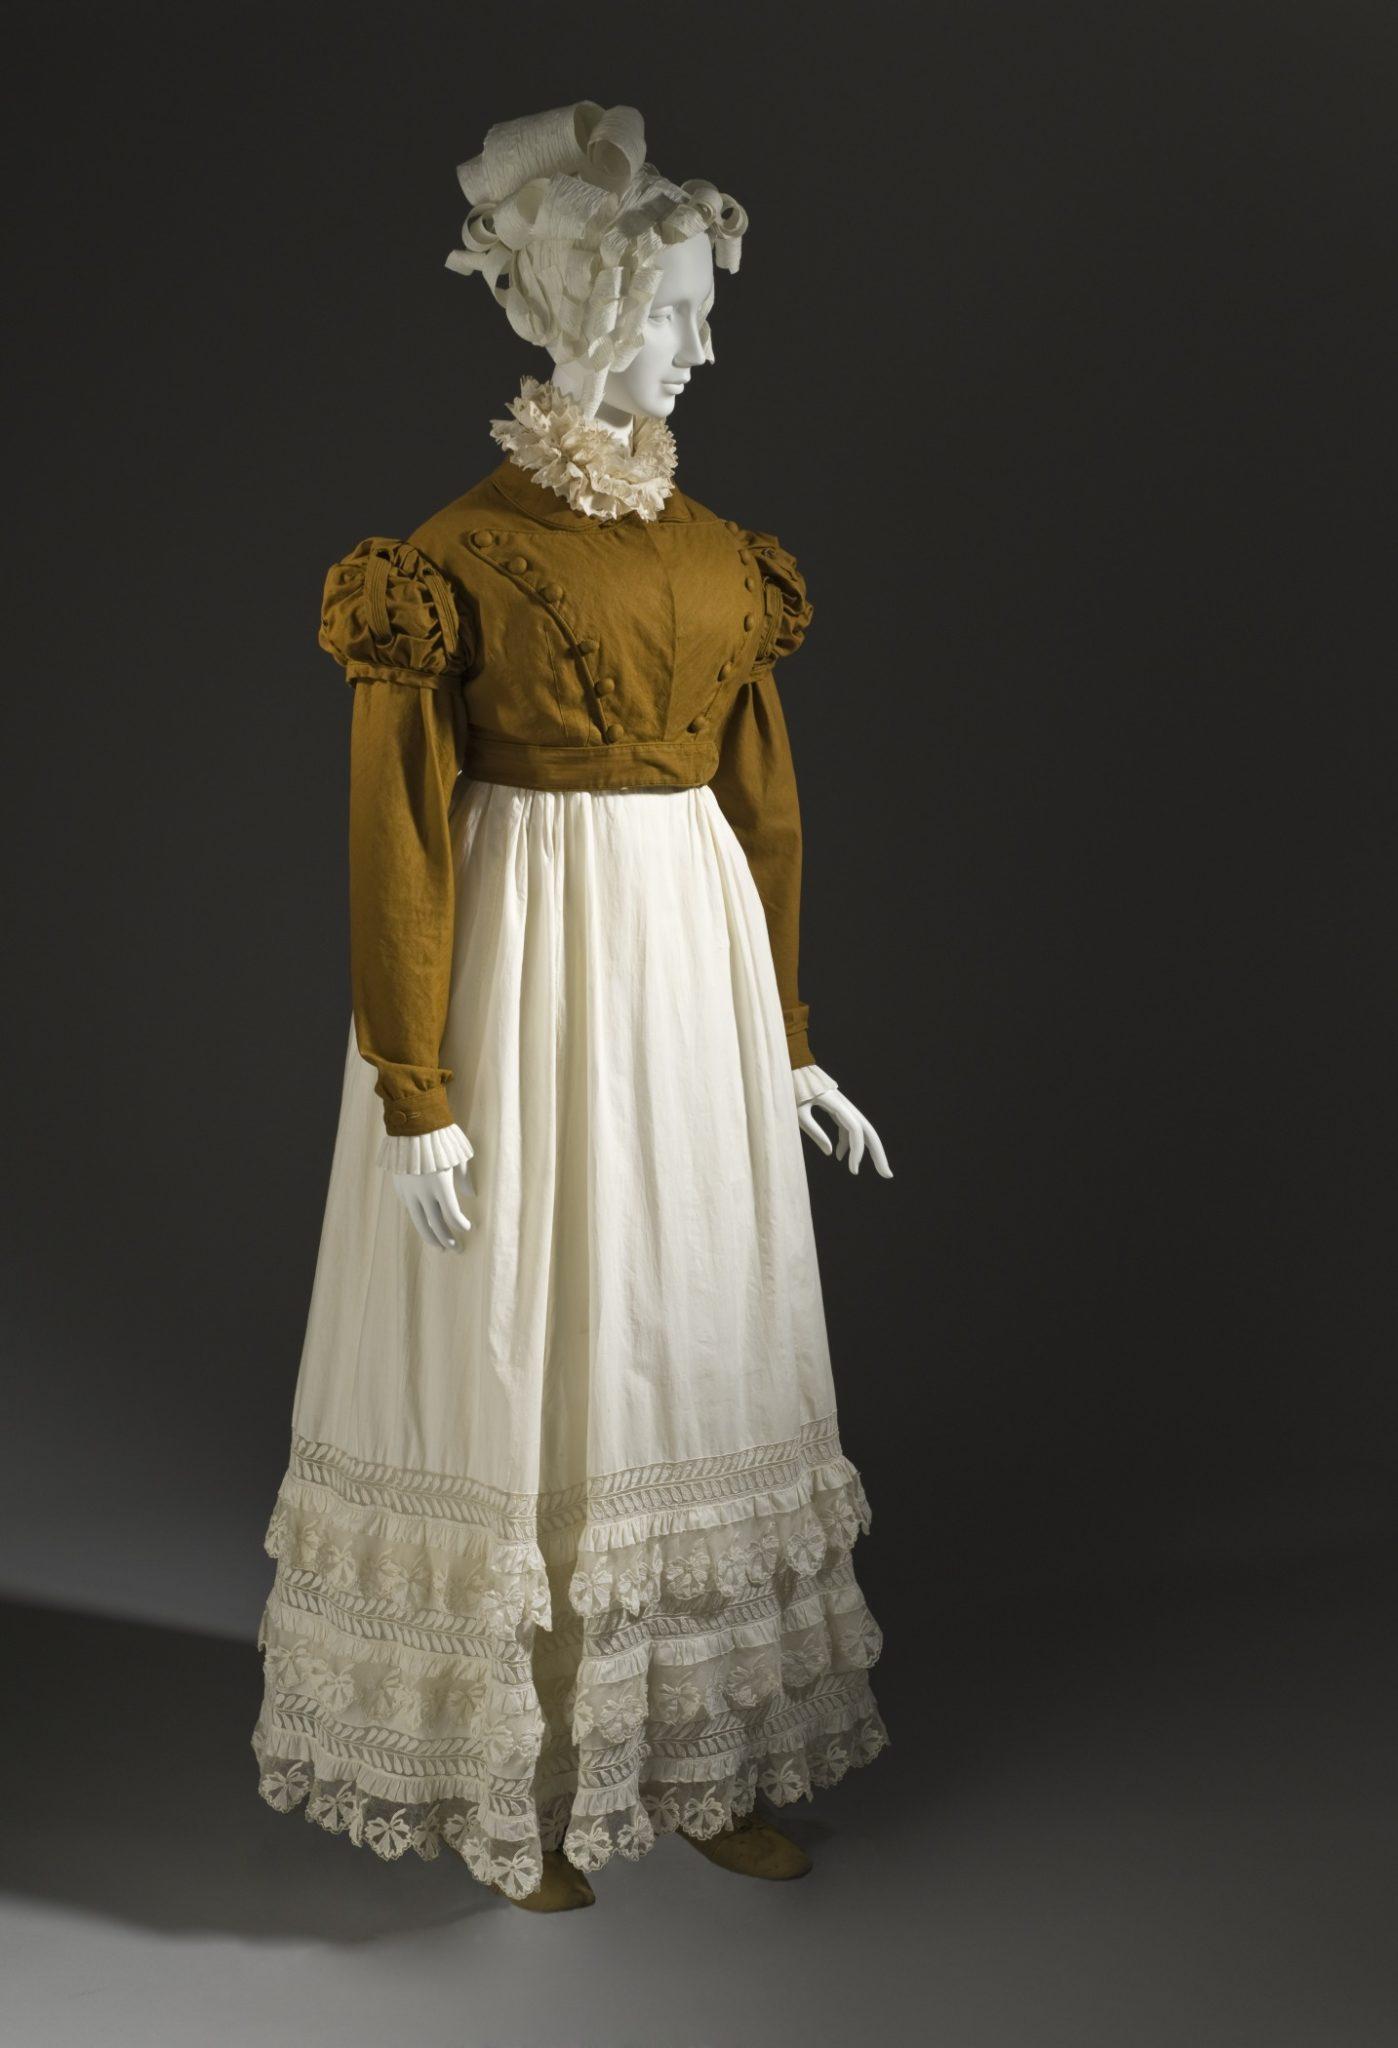 Spencer jacket & skirt, France, circa 1815, Jacket- cotton plain weave; skirt- cotton plain weave with linen net and cotton plain-weave appliqués, LACMA M.2007.211.15a-b